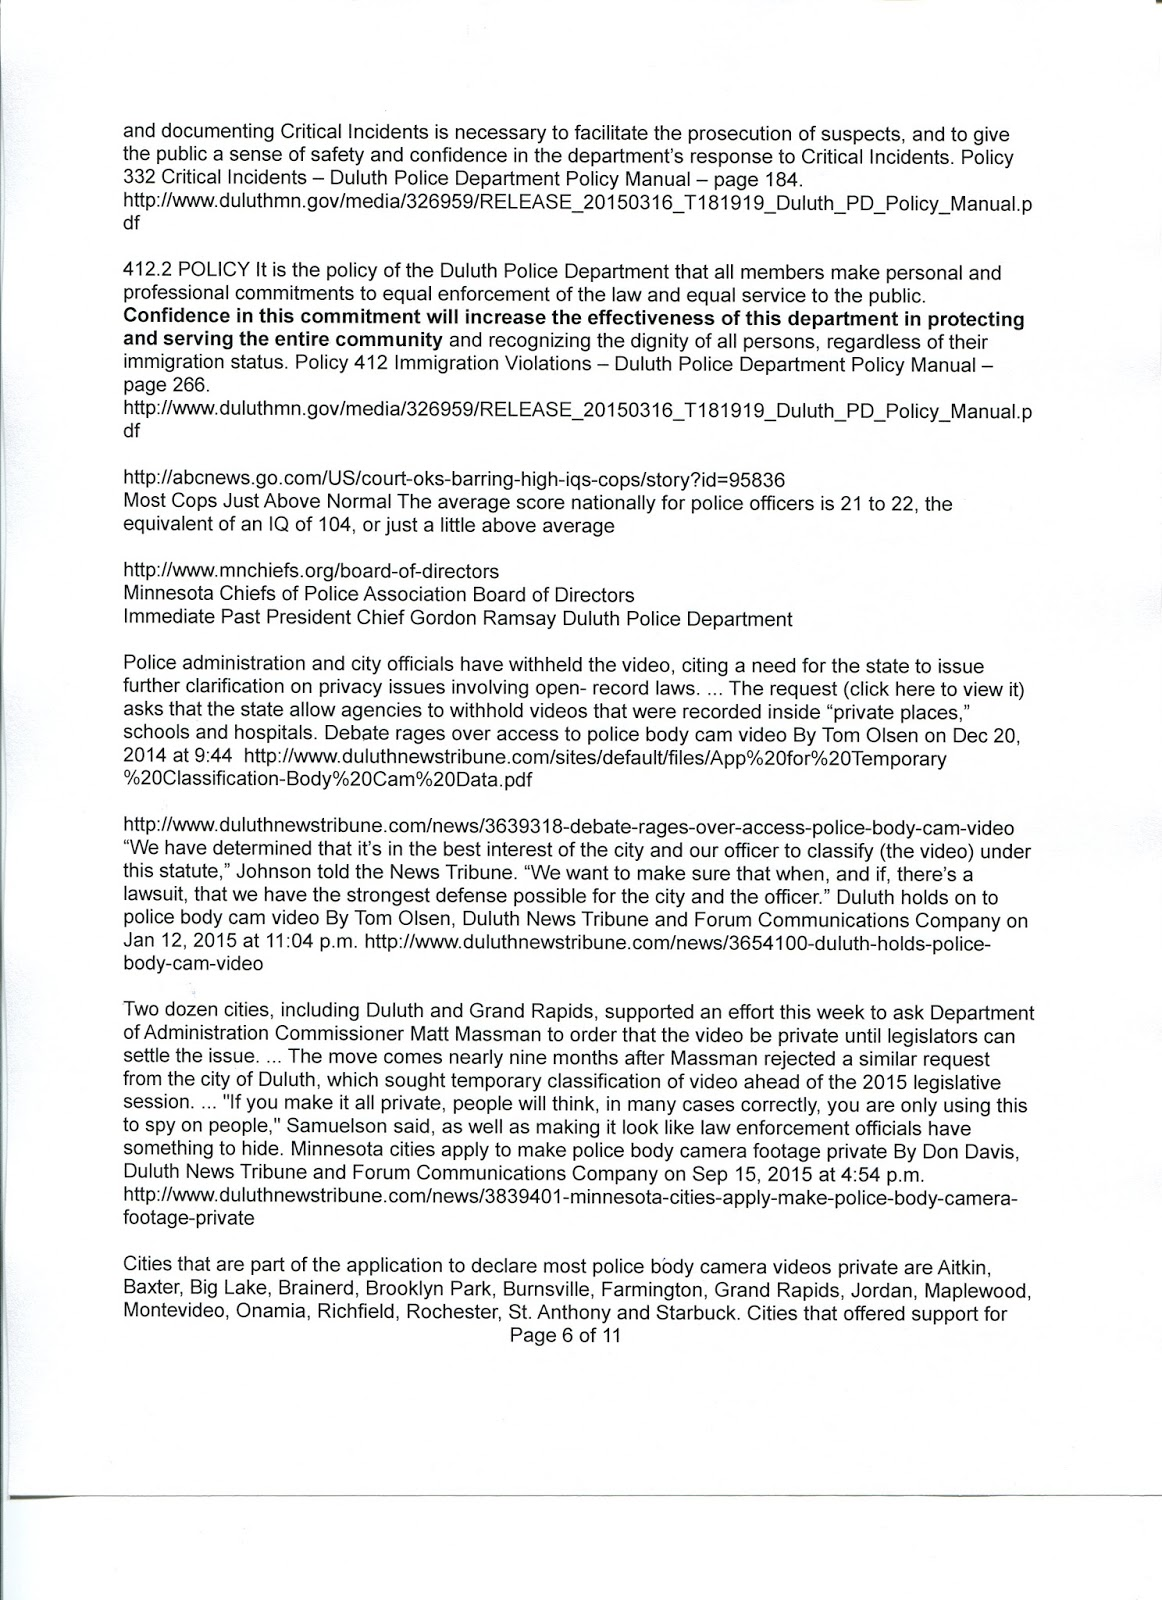 critical response essay format sample resume skills profile critical response essay format neurology nurse sample resume cmpltramsay06 critical response essay formathtml